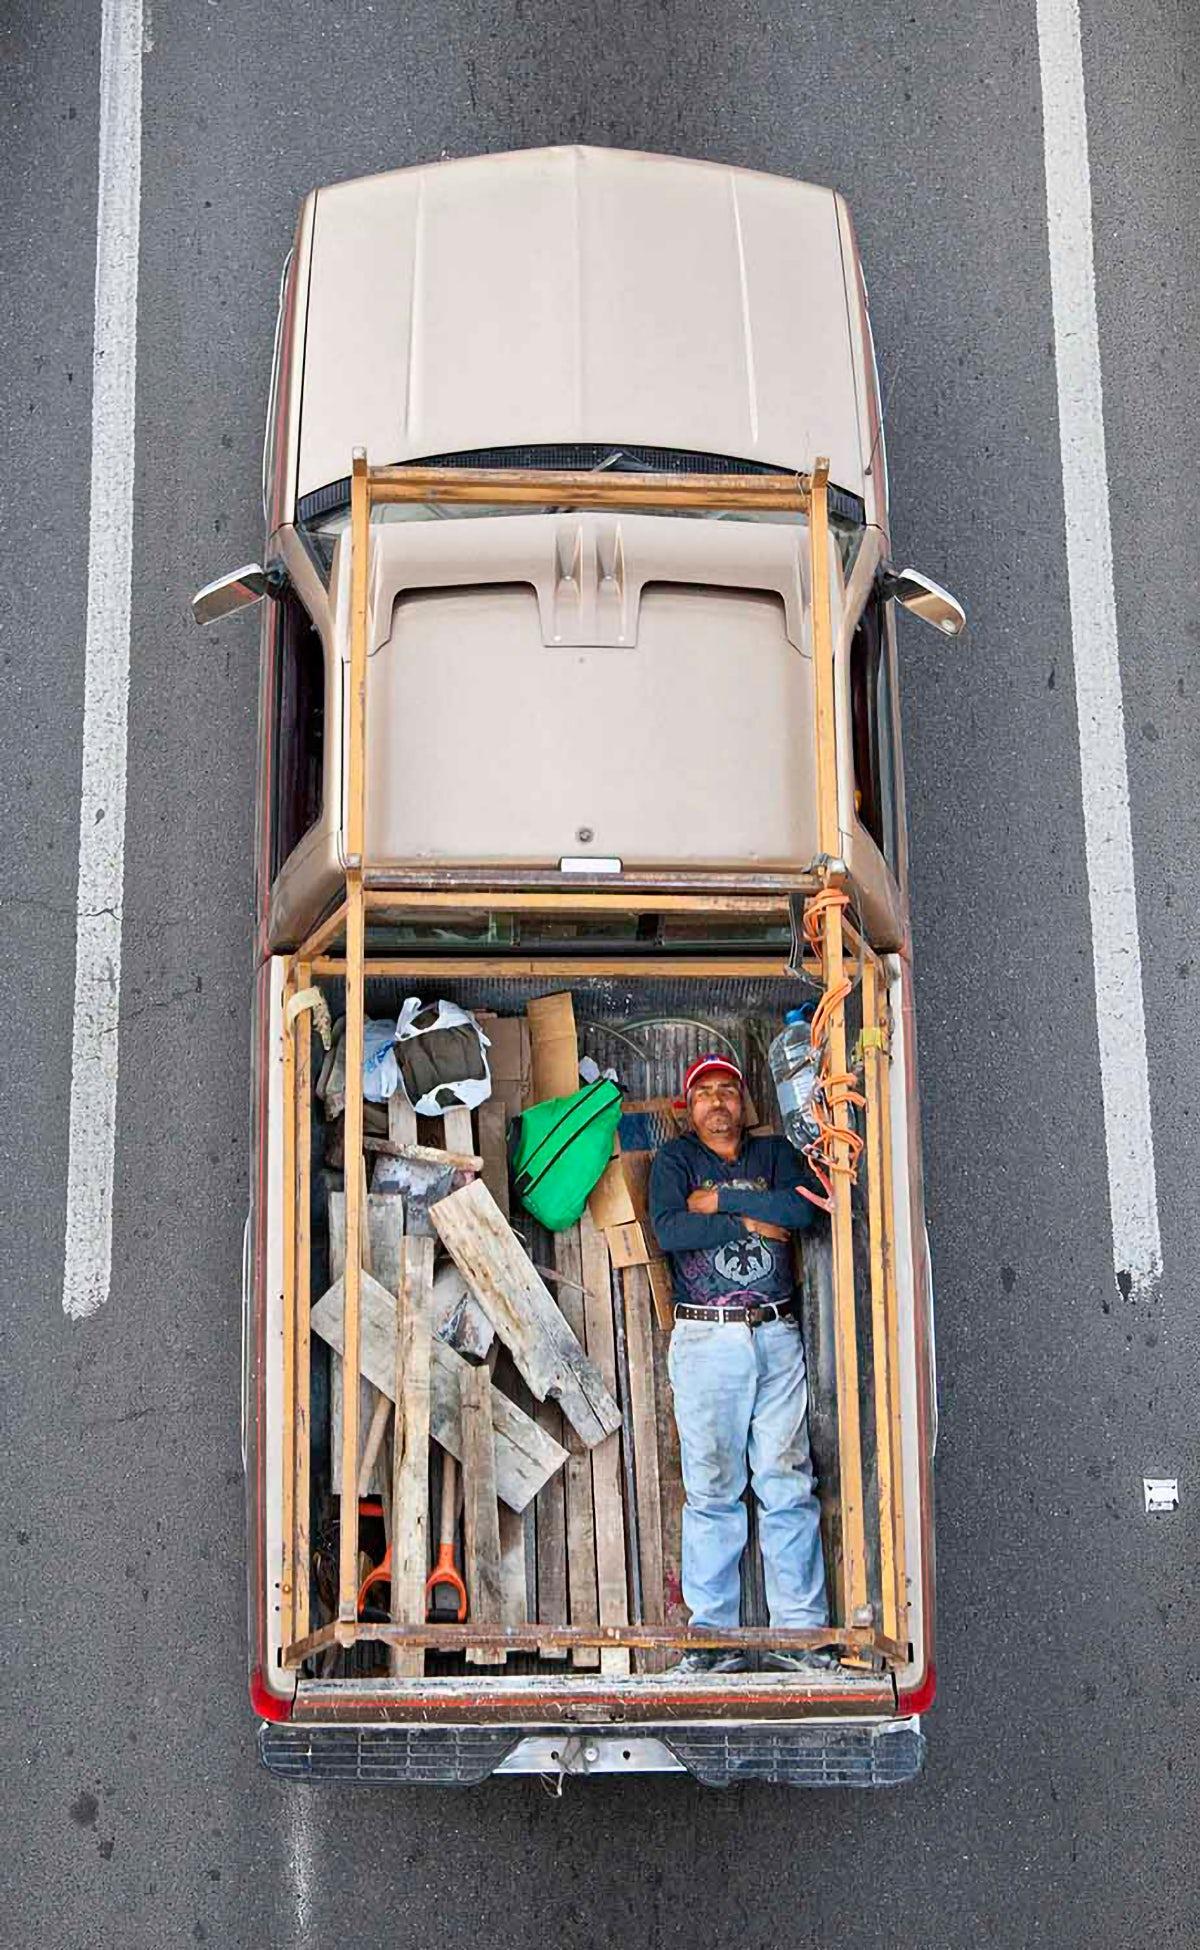 Alejandro Cartagena image of carpoolers in King's Cross exhibition